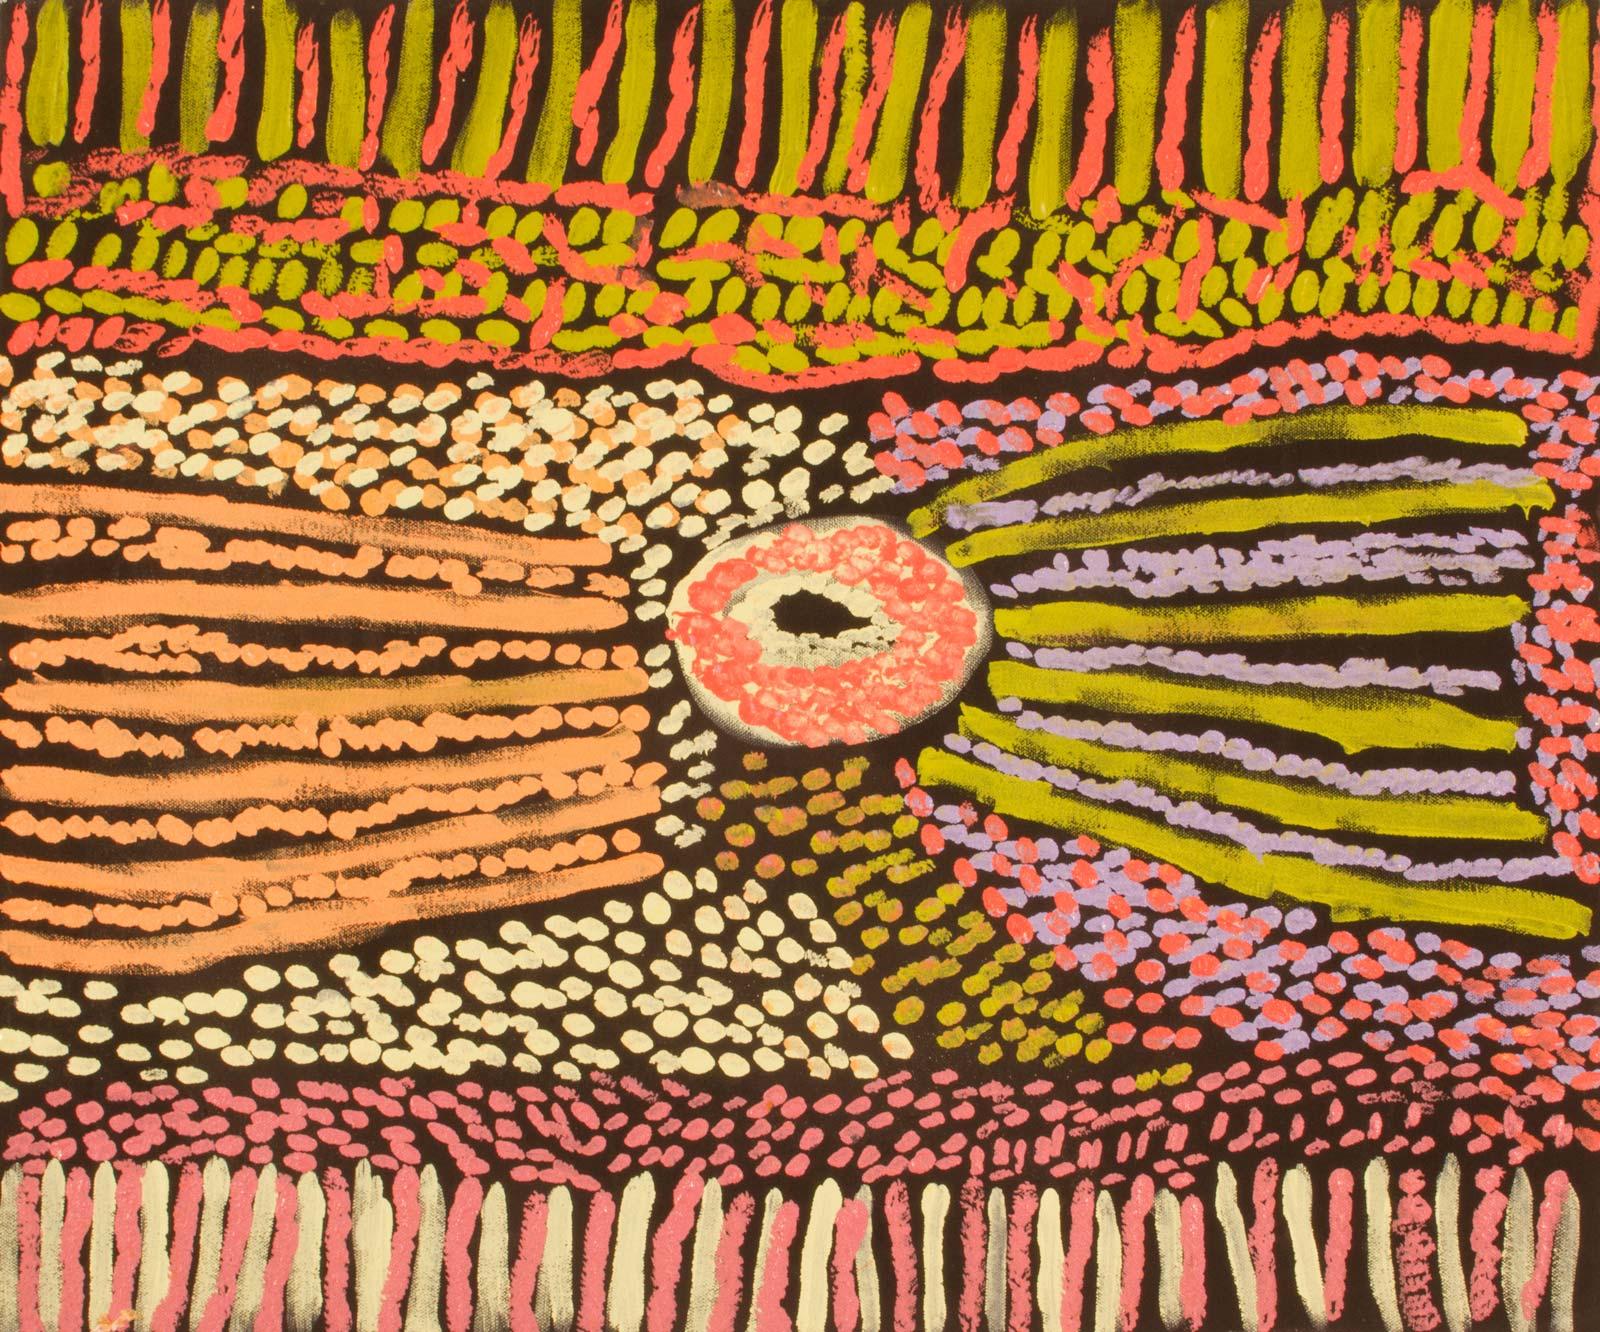 MayWokka Chapman -Courtesy of the artist and Artitja Fine Art